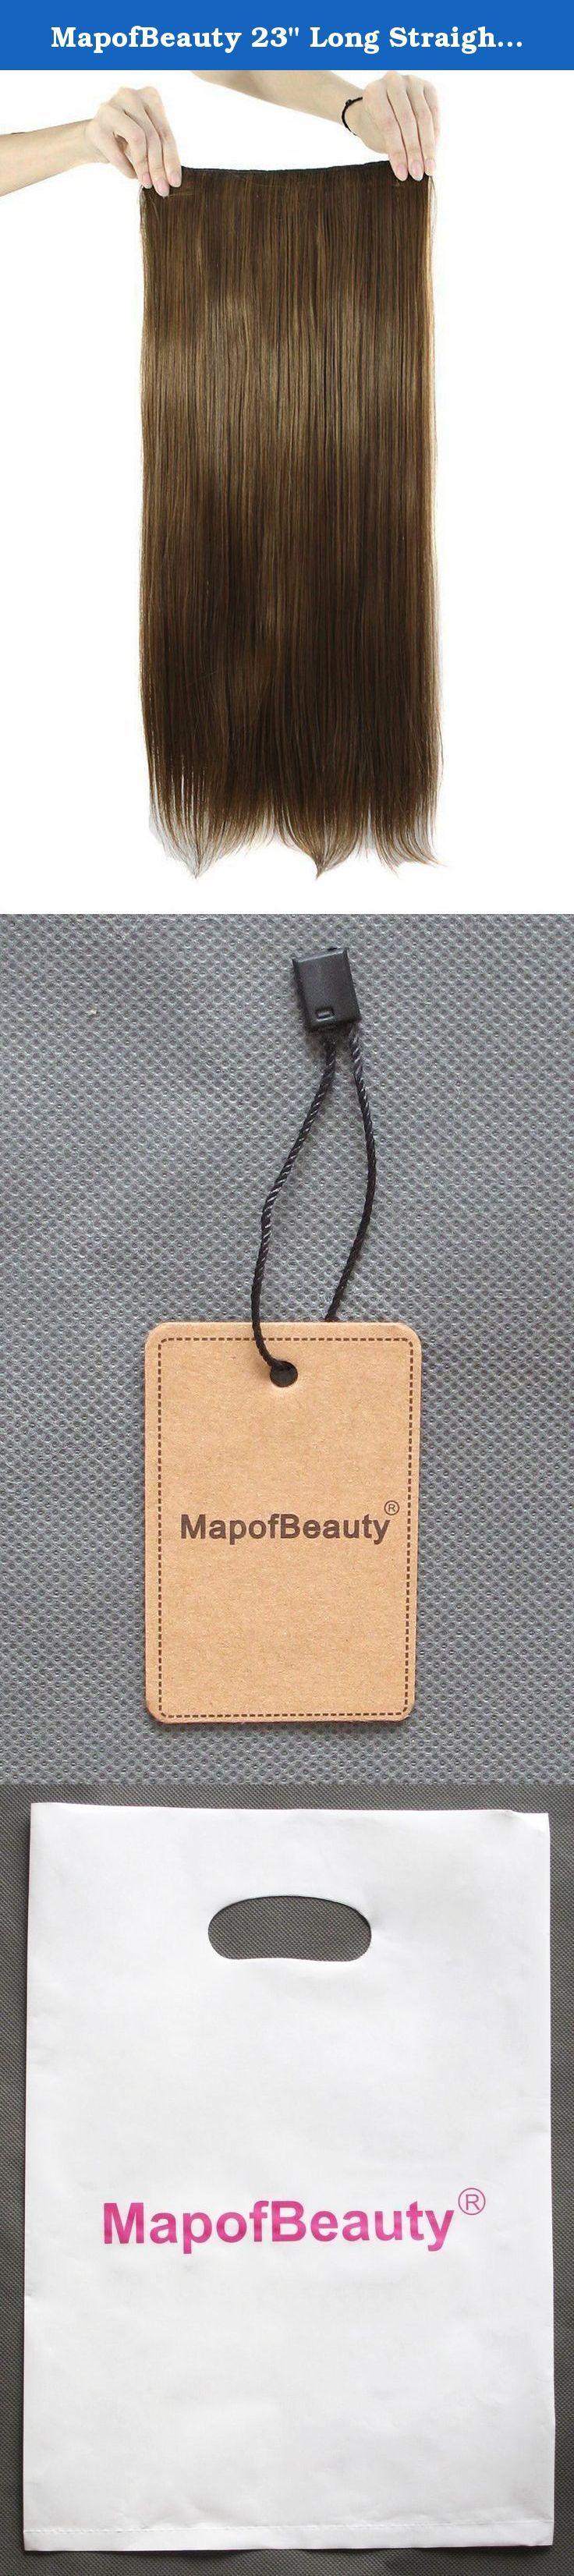 "MapofBeauty 23"" Long Straight Clip in Hair Extensions Hairpieces (Brown). MapofBeauty 23"" Long Straight Clip in Hair Extensions Hairpieces."